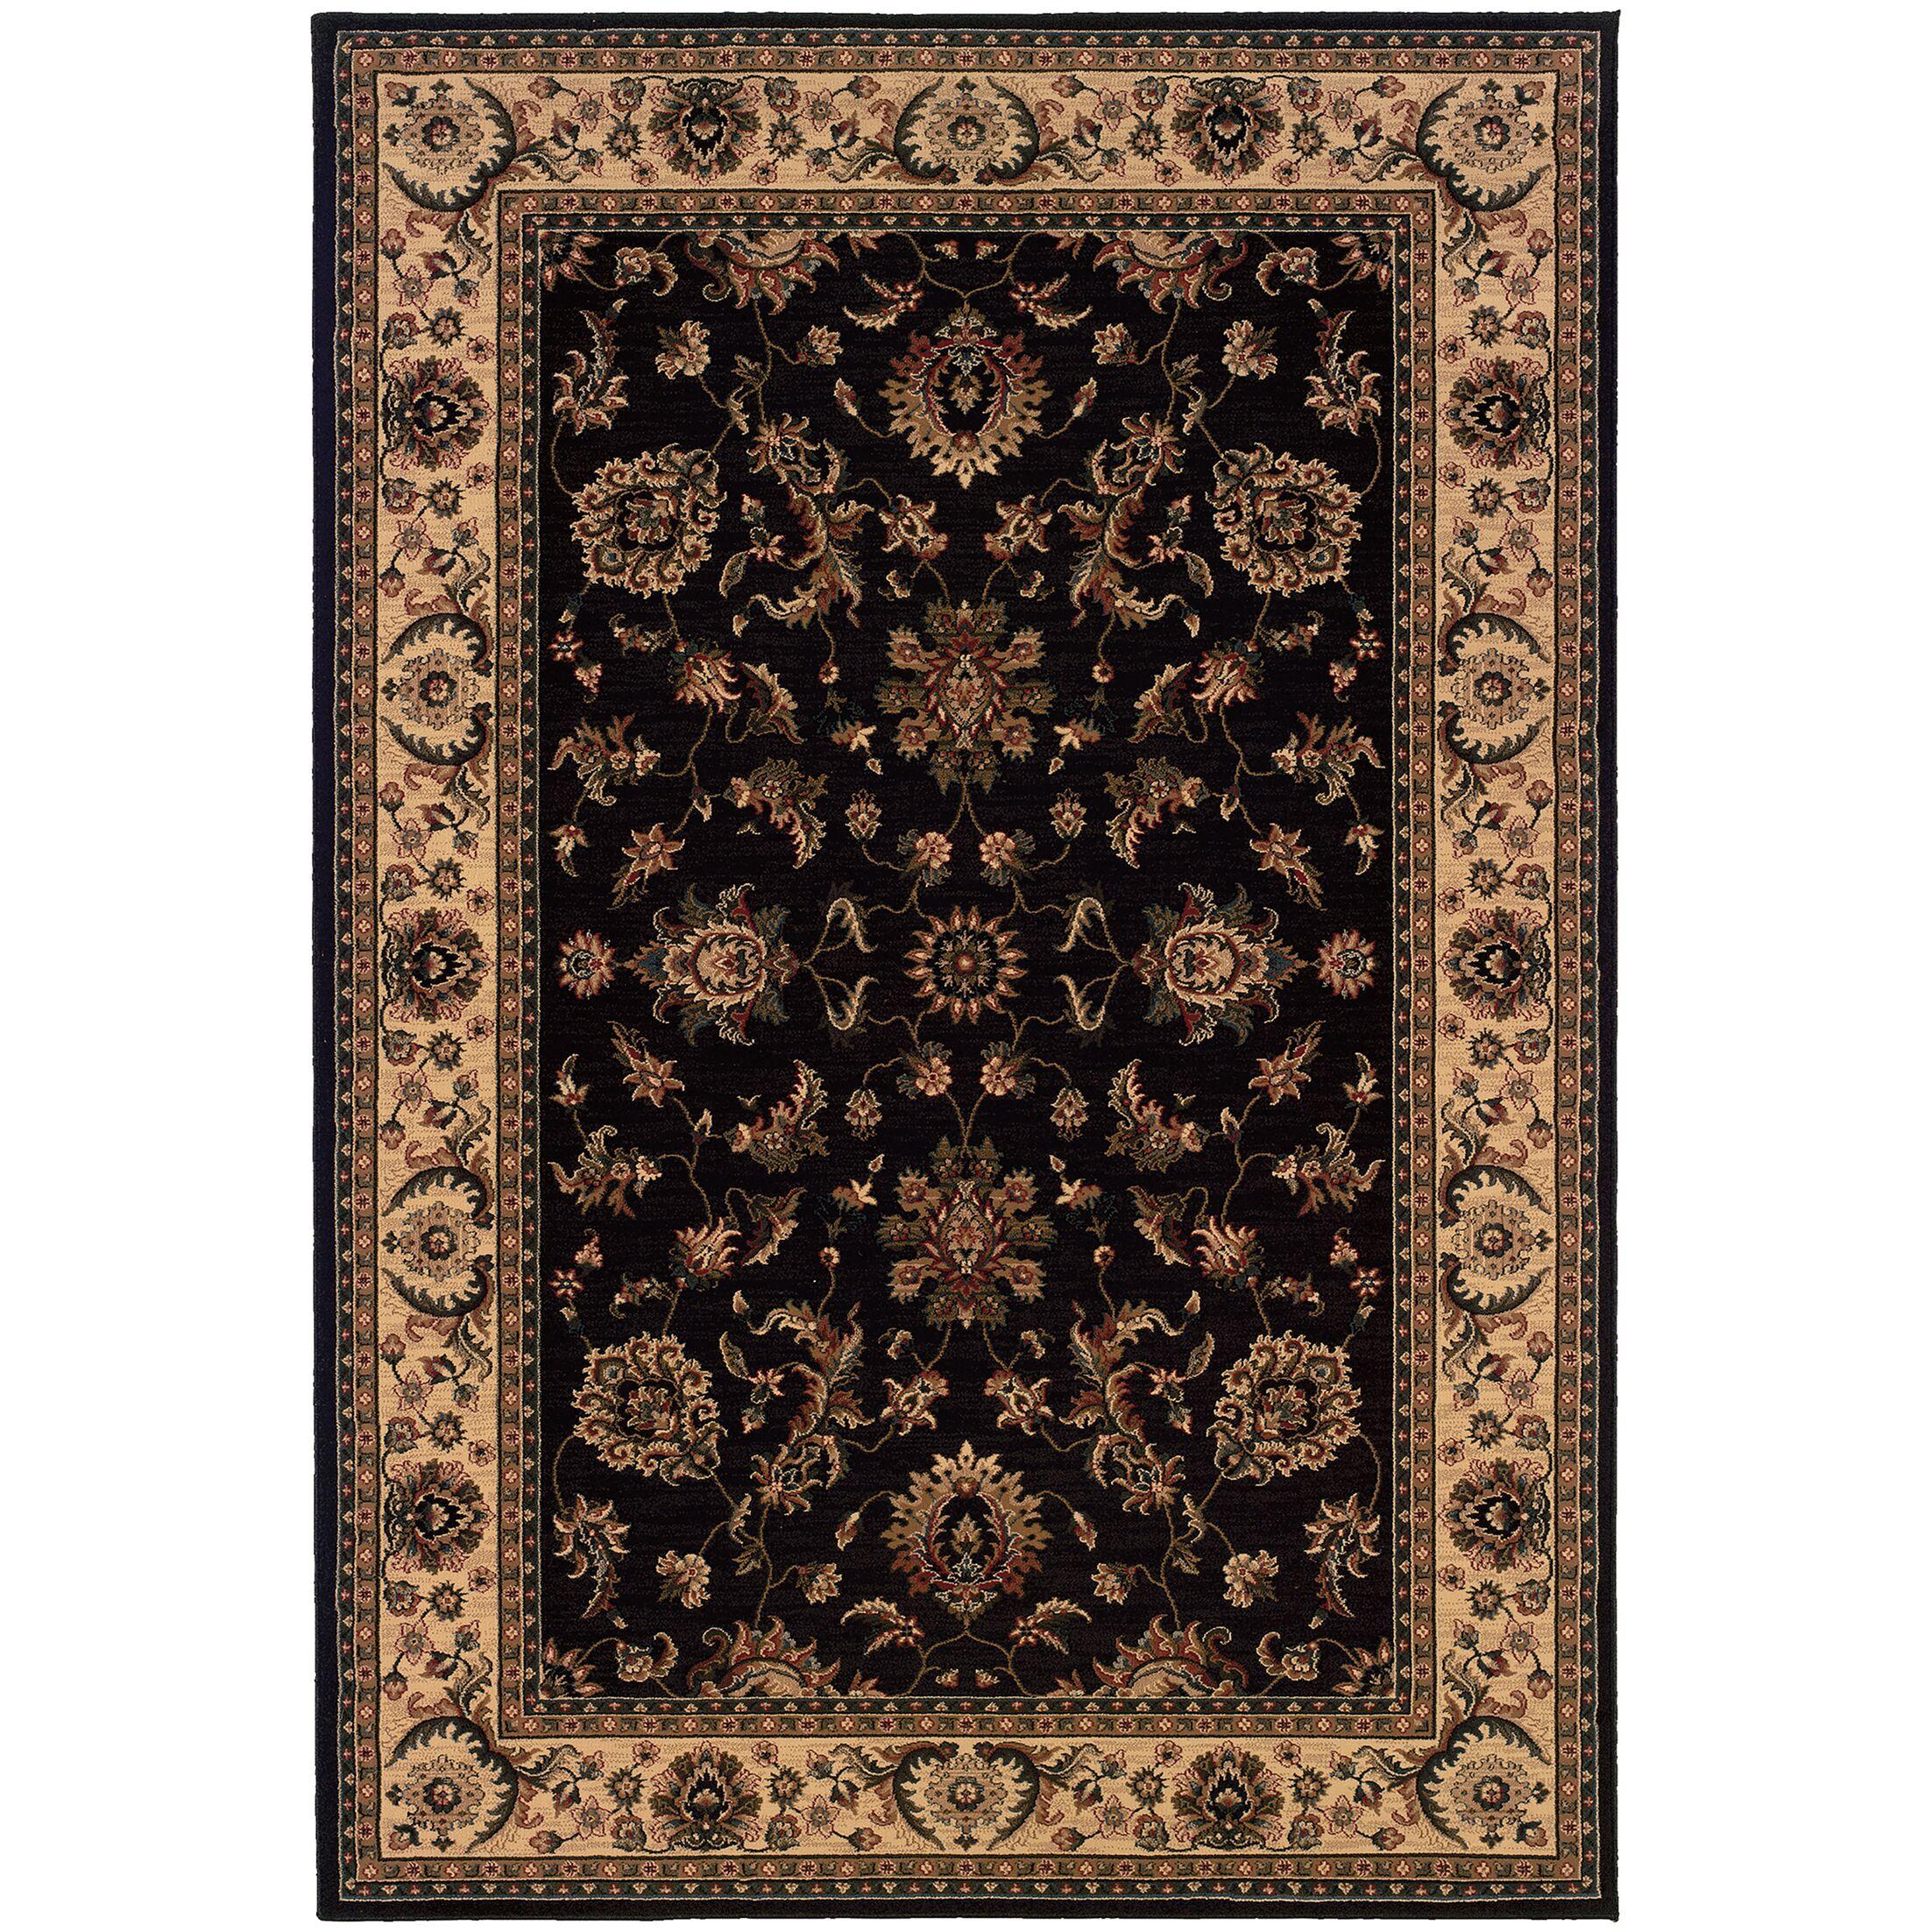 Shelburne Persian Hand Woven Beige/Black Area Rug Rug Size: Rectangle 5'3